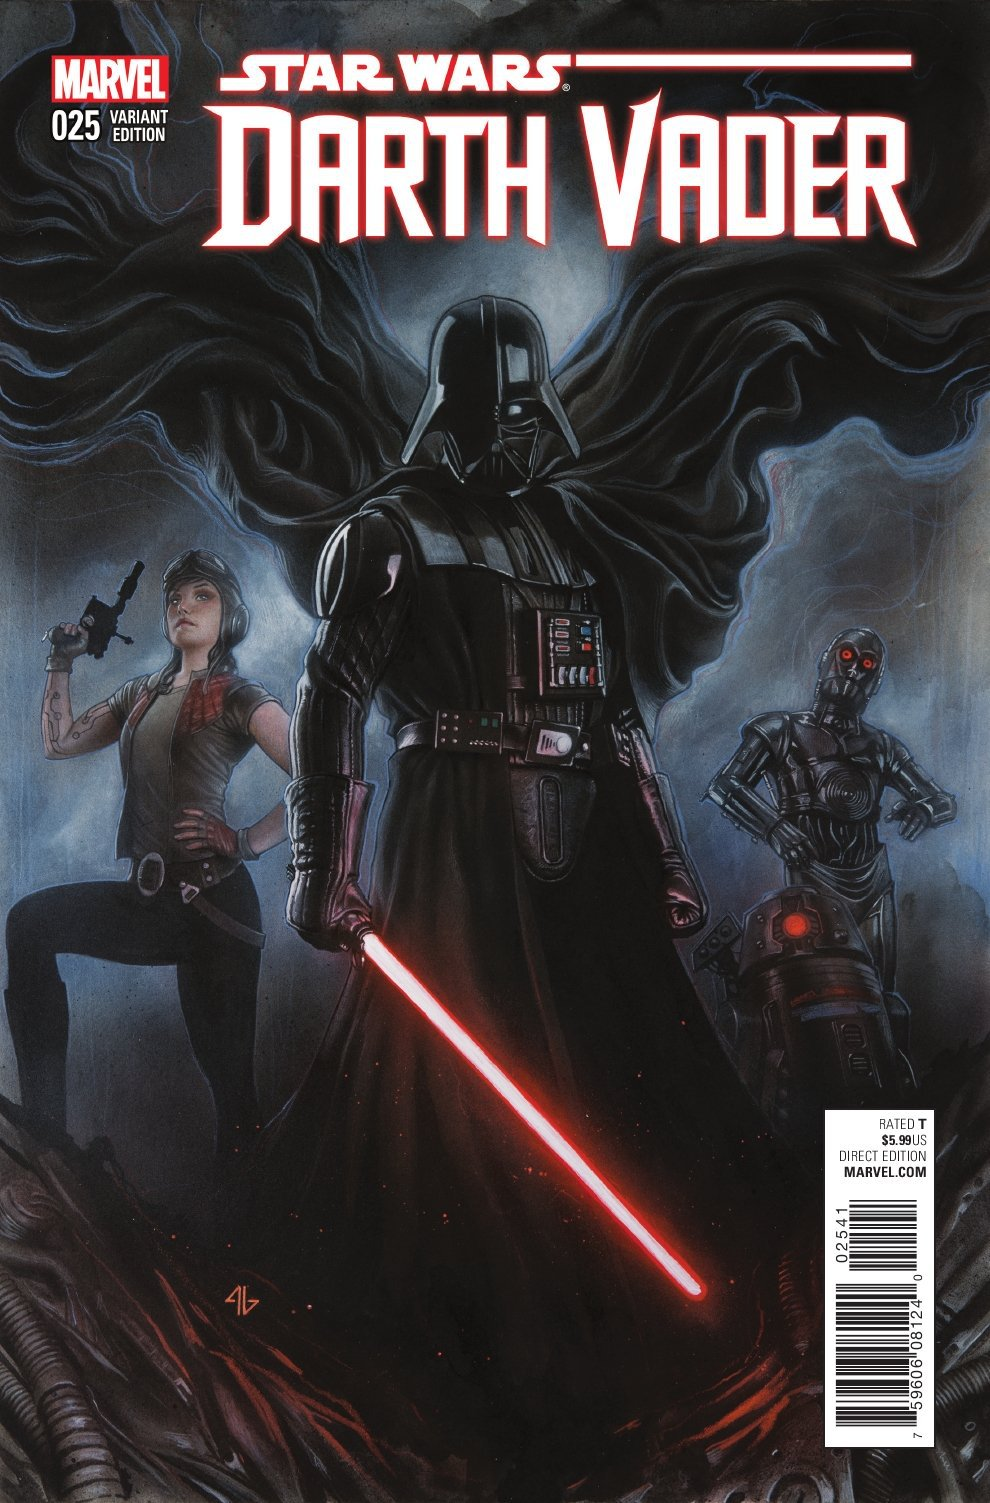 Darth Vader #25 (Adi Granov Variant Cover) (12.10.2016)